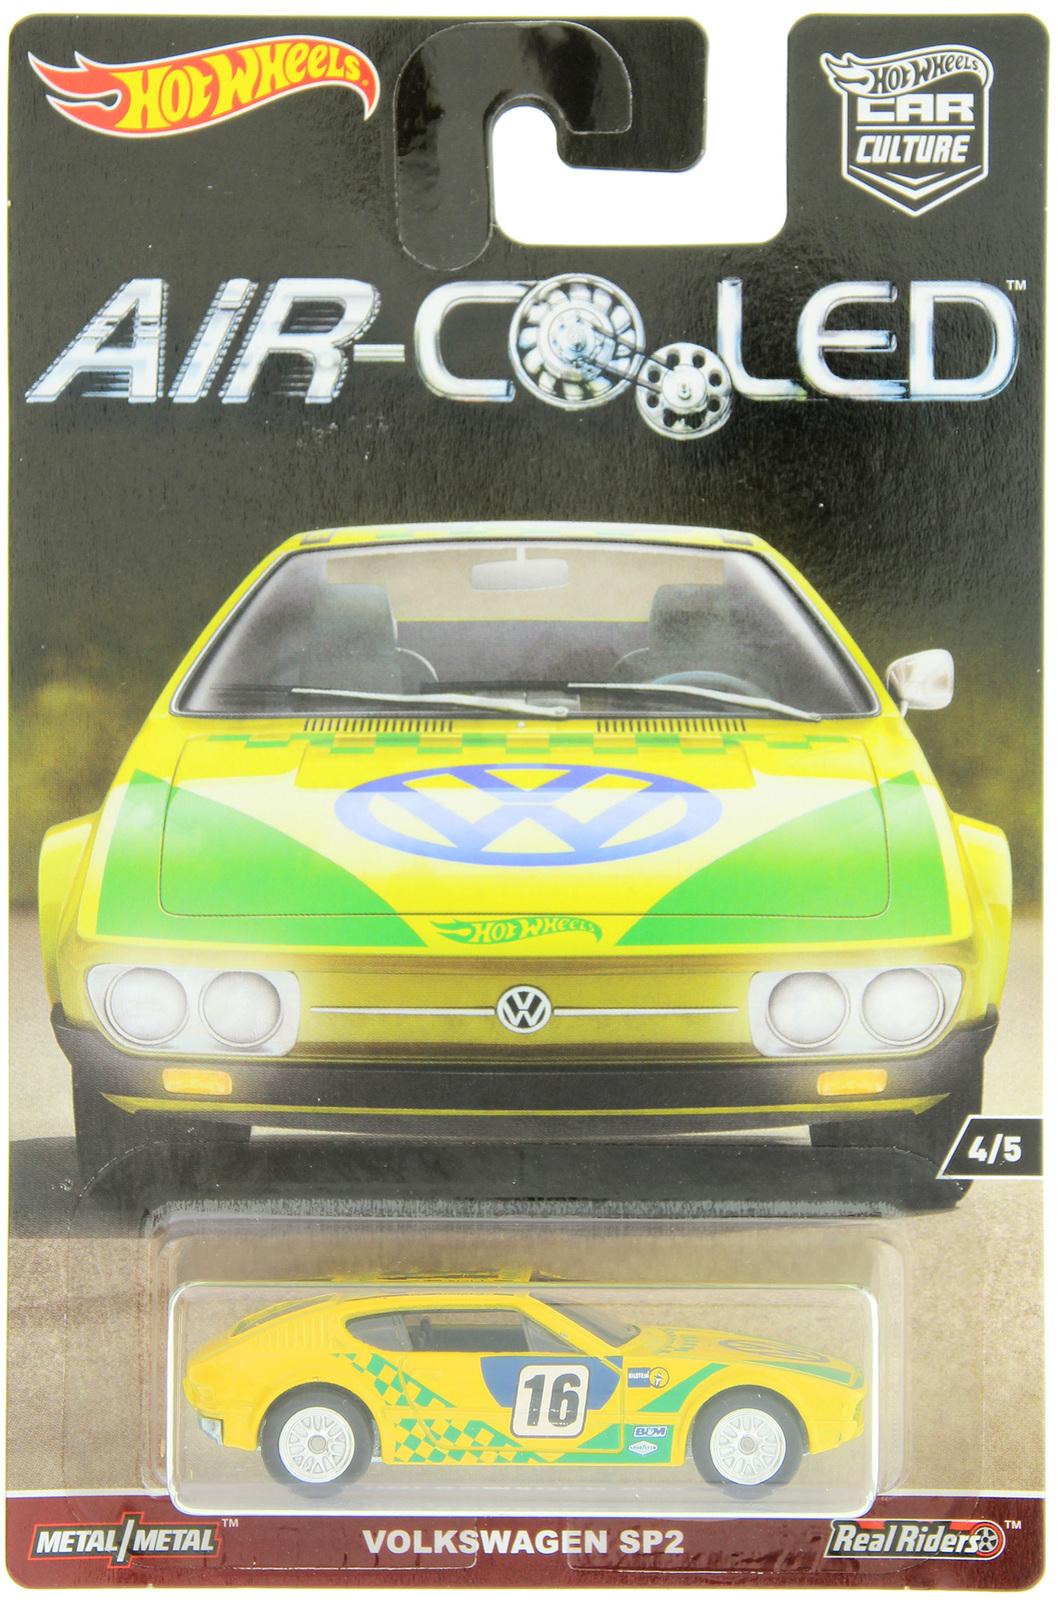 Hot Wheels Car Culture - Volkswagen SP2 image